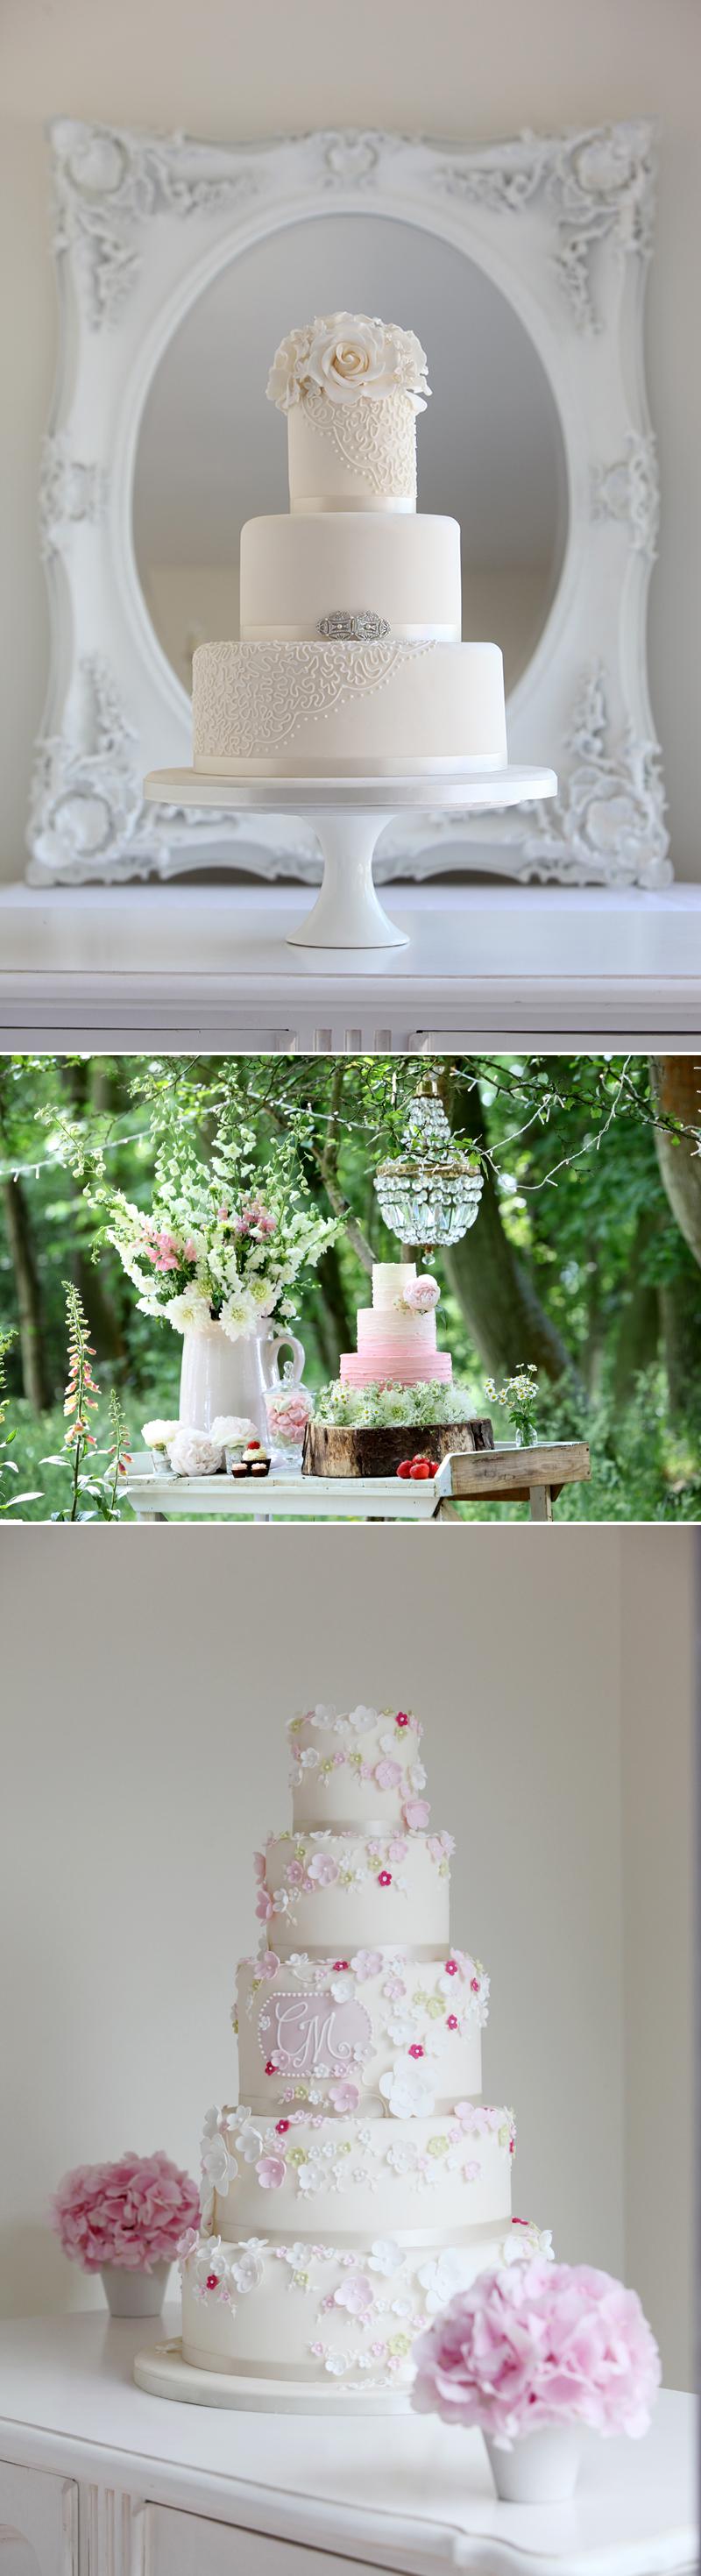 wedding-cake-inspiration-wedding-trends-2015-cake-maison-coco-wedding-venues-2